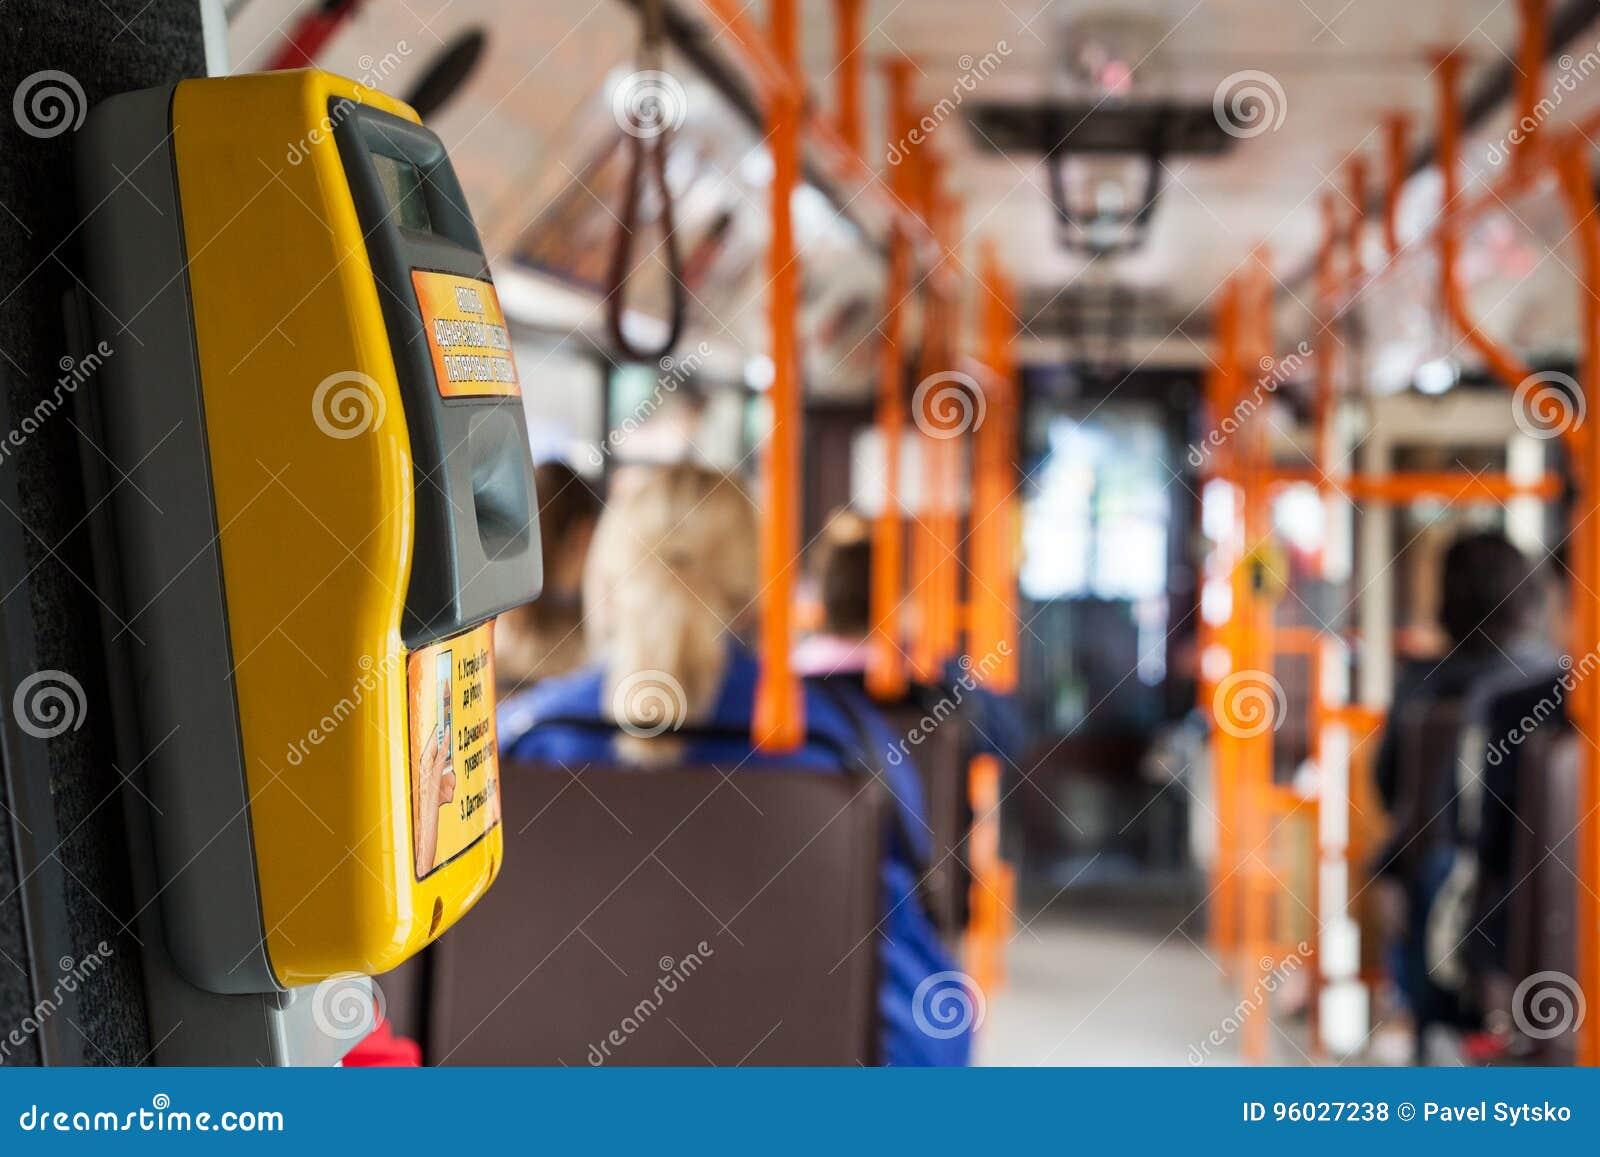 Bileta validator na transportu publicznego autobusie